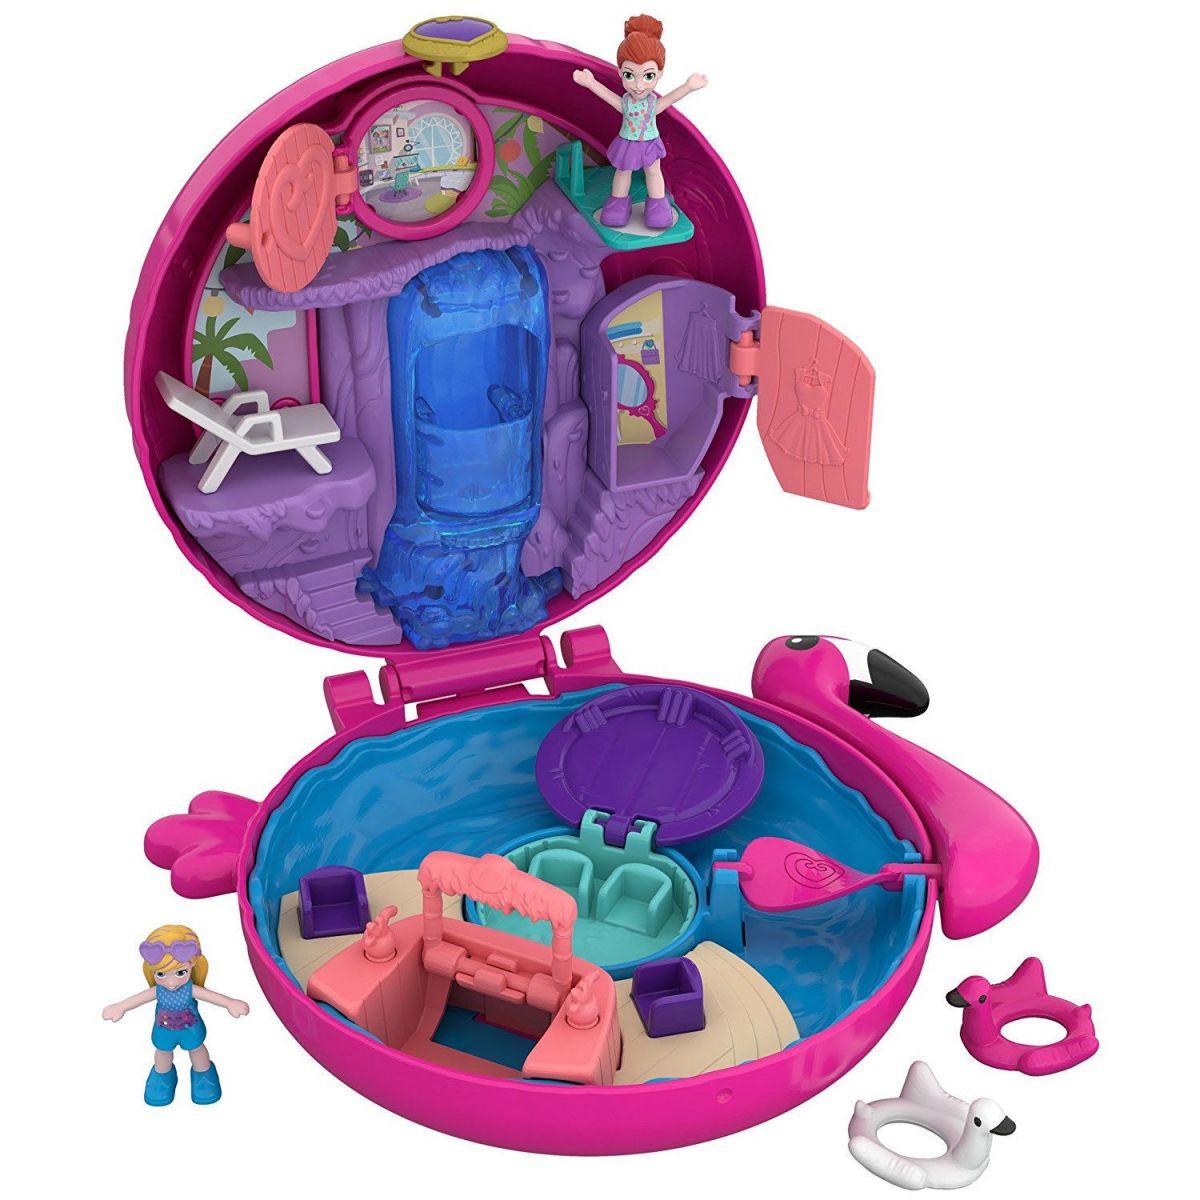 Mattel Polly Pocket svet do vrecka Flamingo Floatie 38